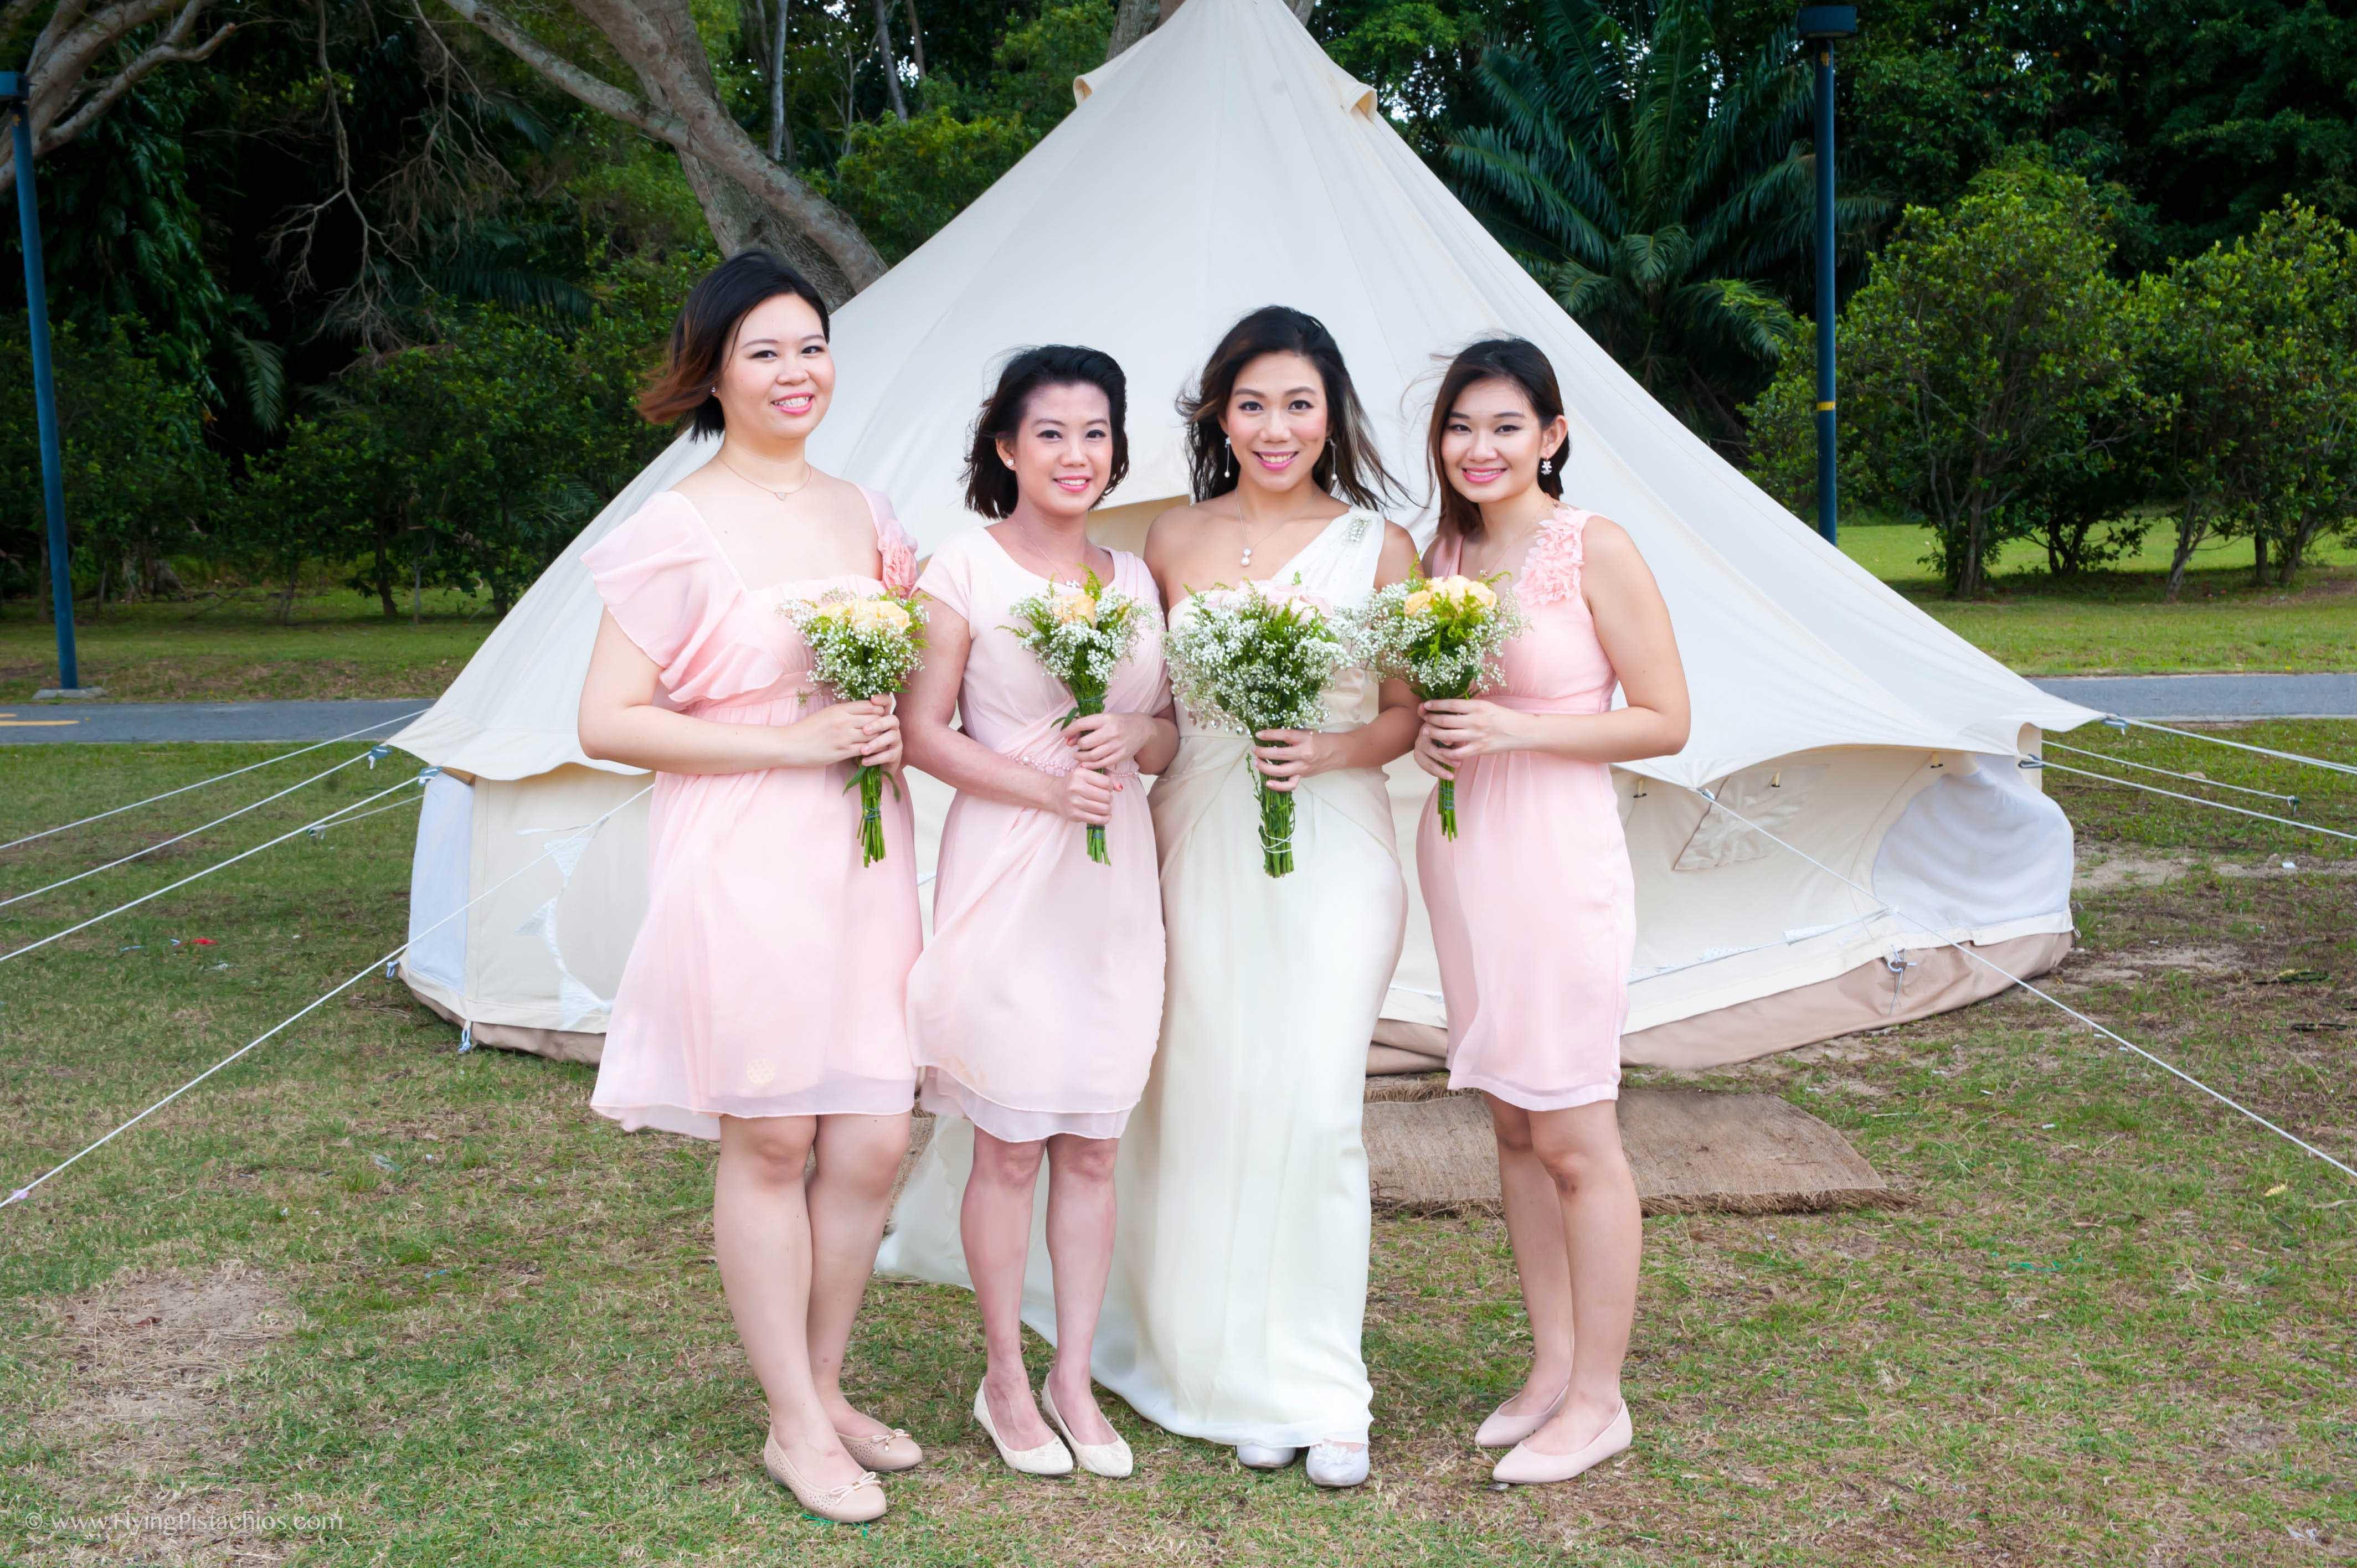 Singapore Popular Fashion Blogger